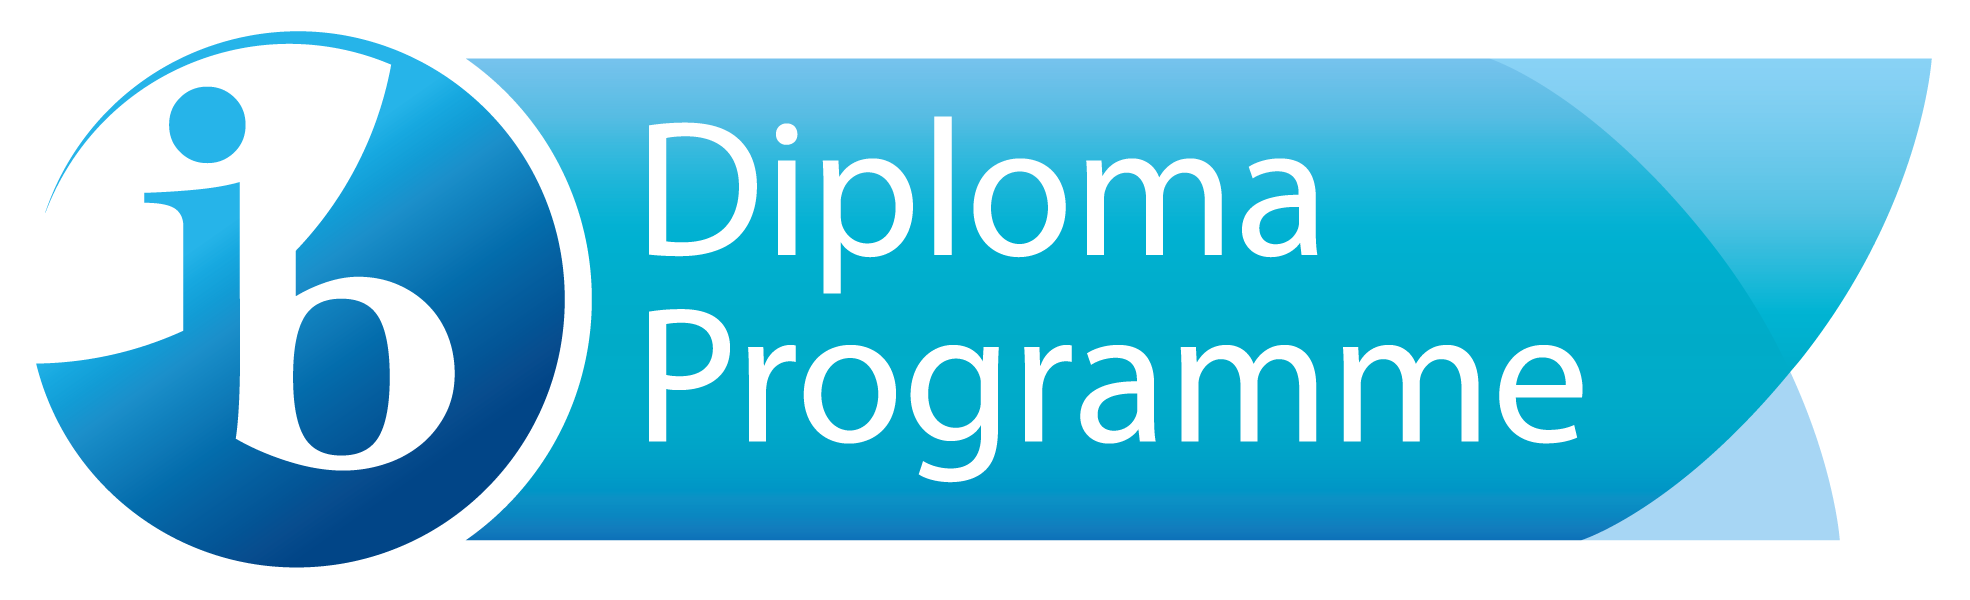 Logo Ar International Png - Dp Programme Logo [118Kb] Png, Transparent background PNG HD thumbnail